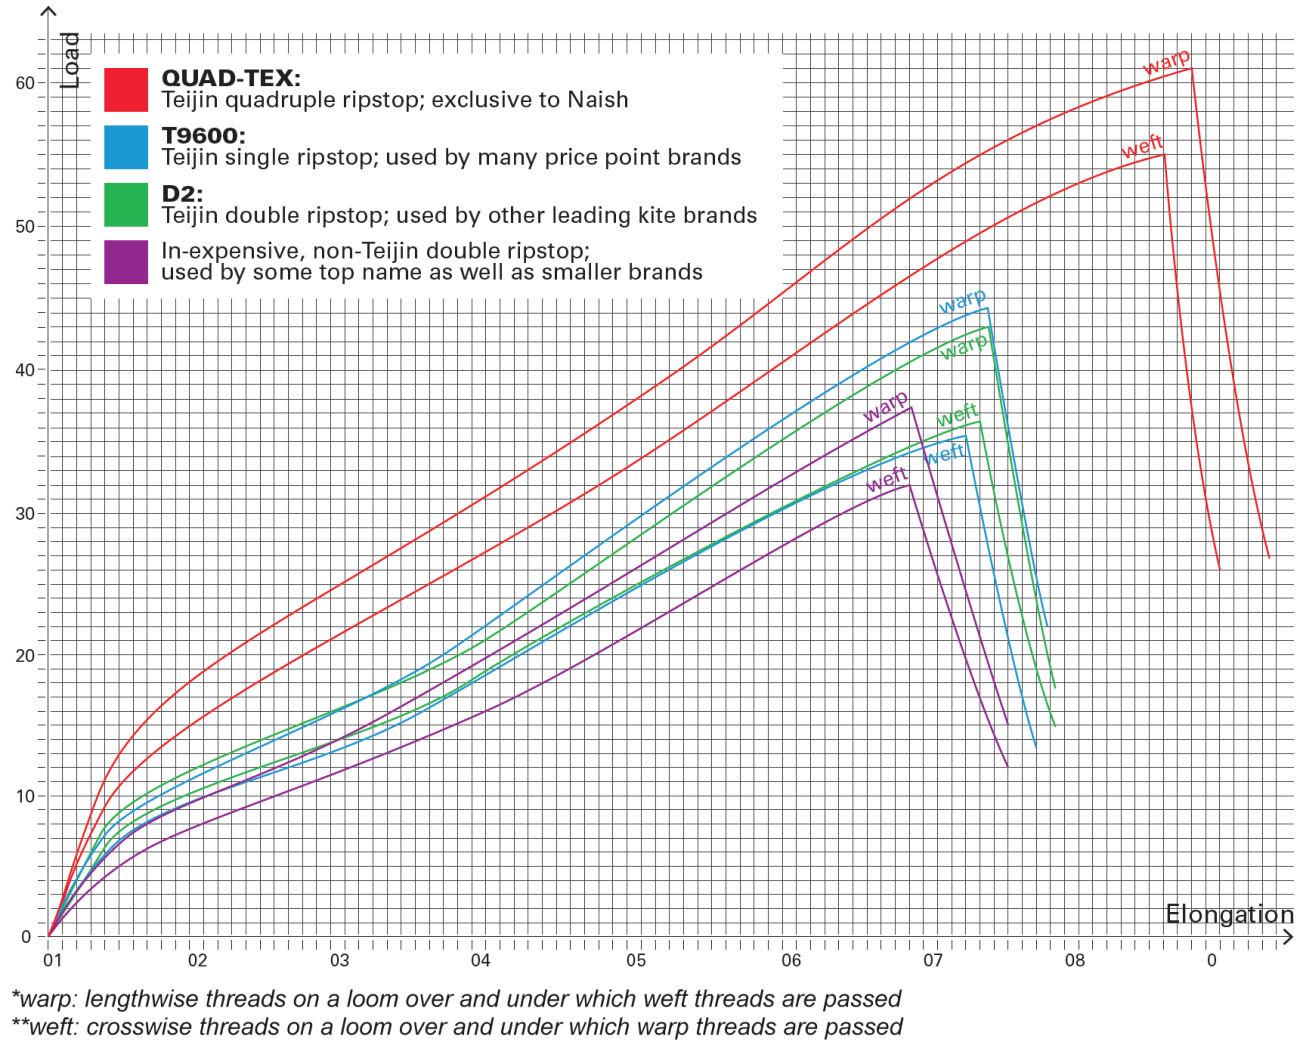 naish-2020-quad-tex-chart